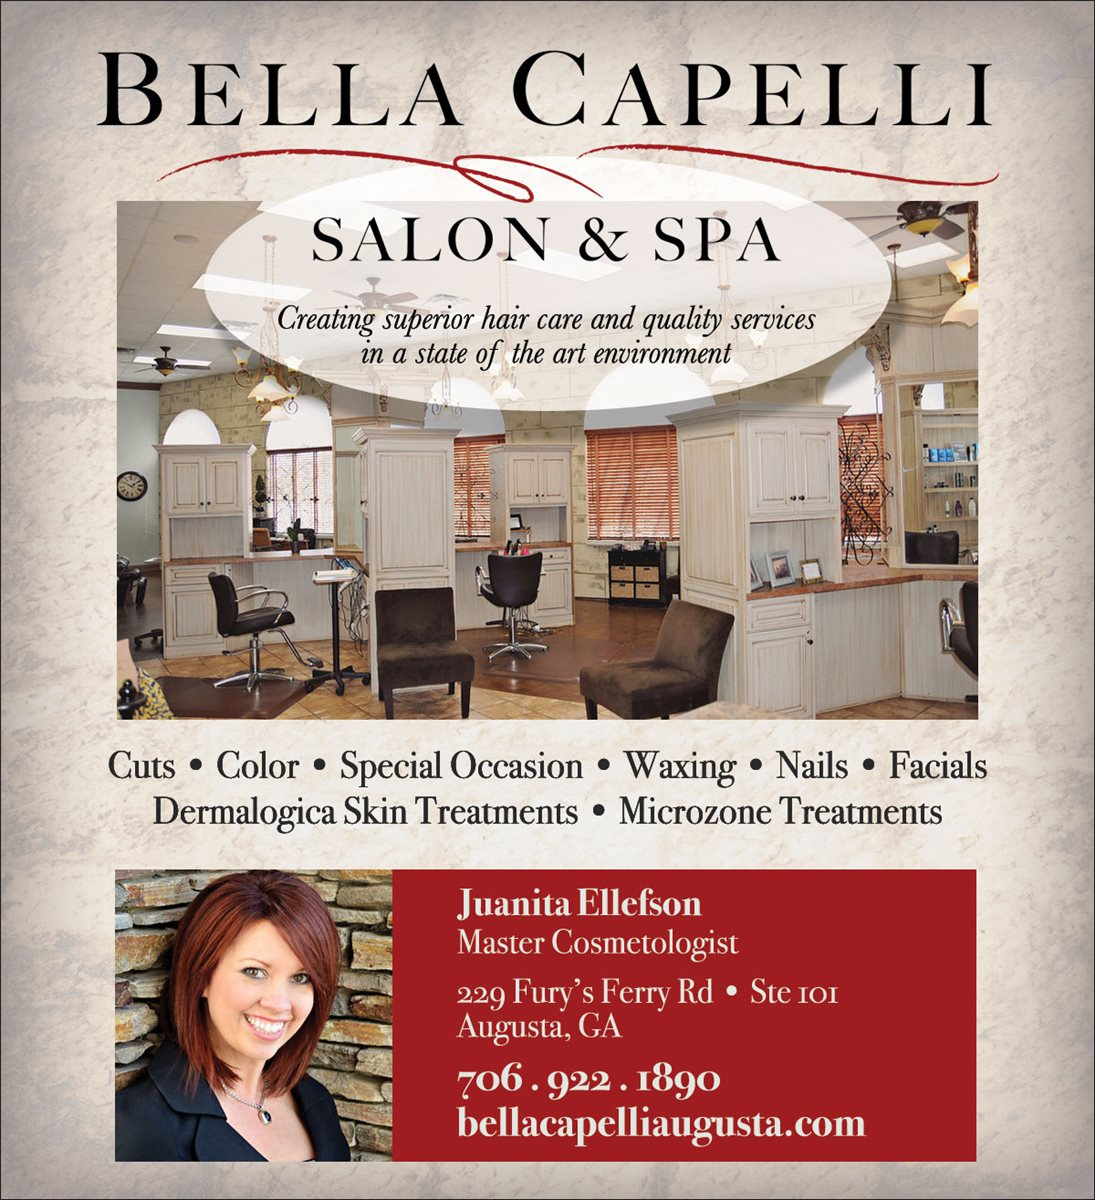 Christians In Business - Bella Capelli Salon & Spa - Details